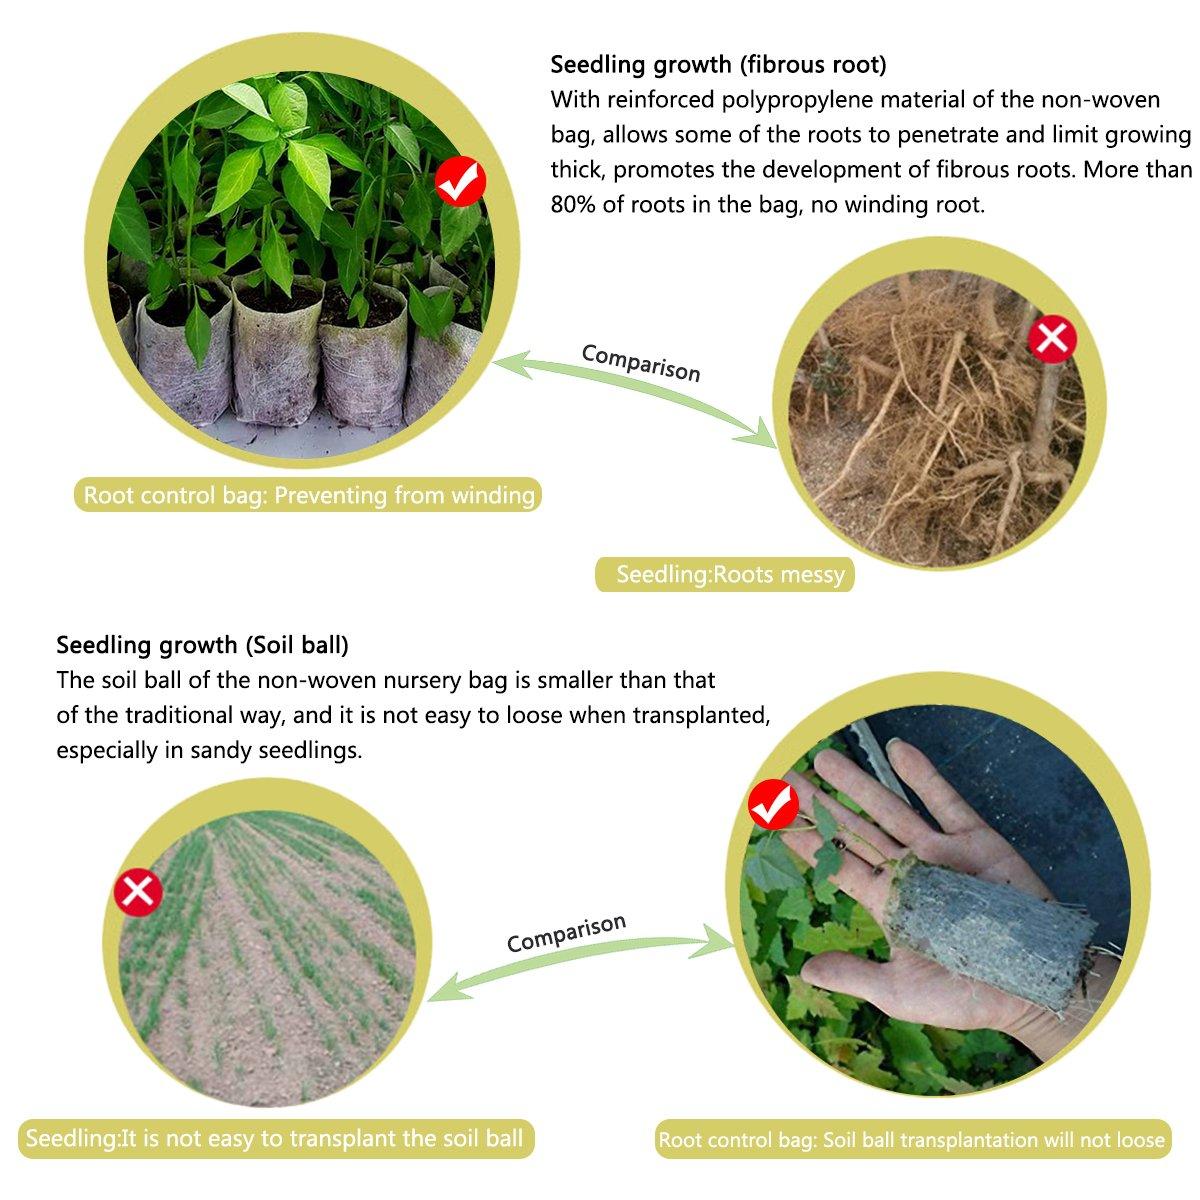 Non-Woven Fabric Sämling abbaubare Pflanzung Gartenbau Nursery Nutrition Bag